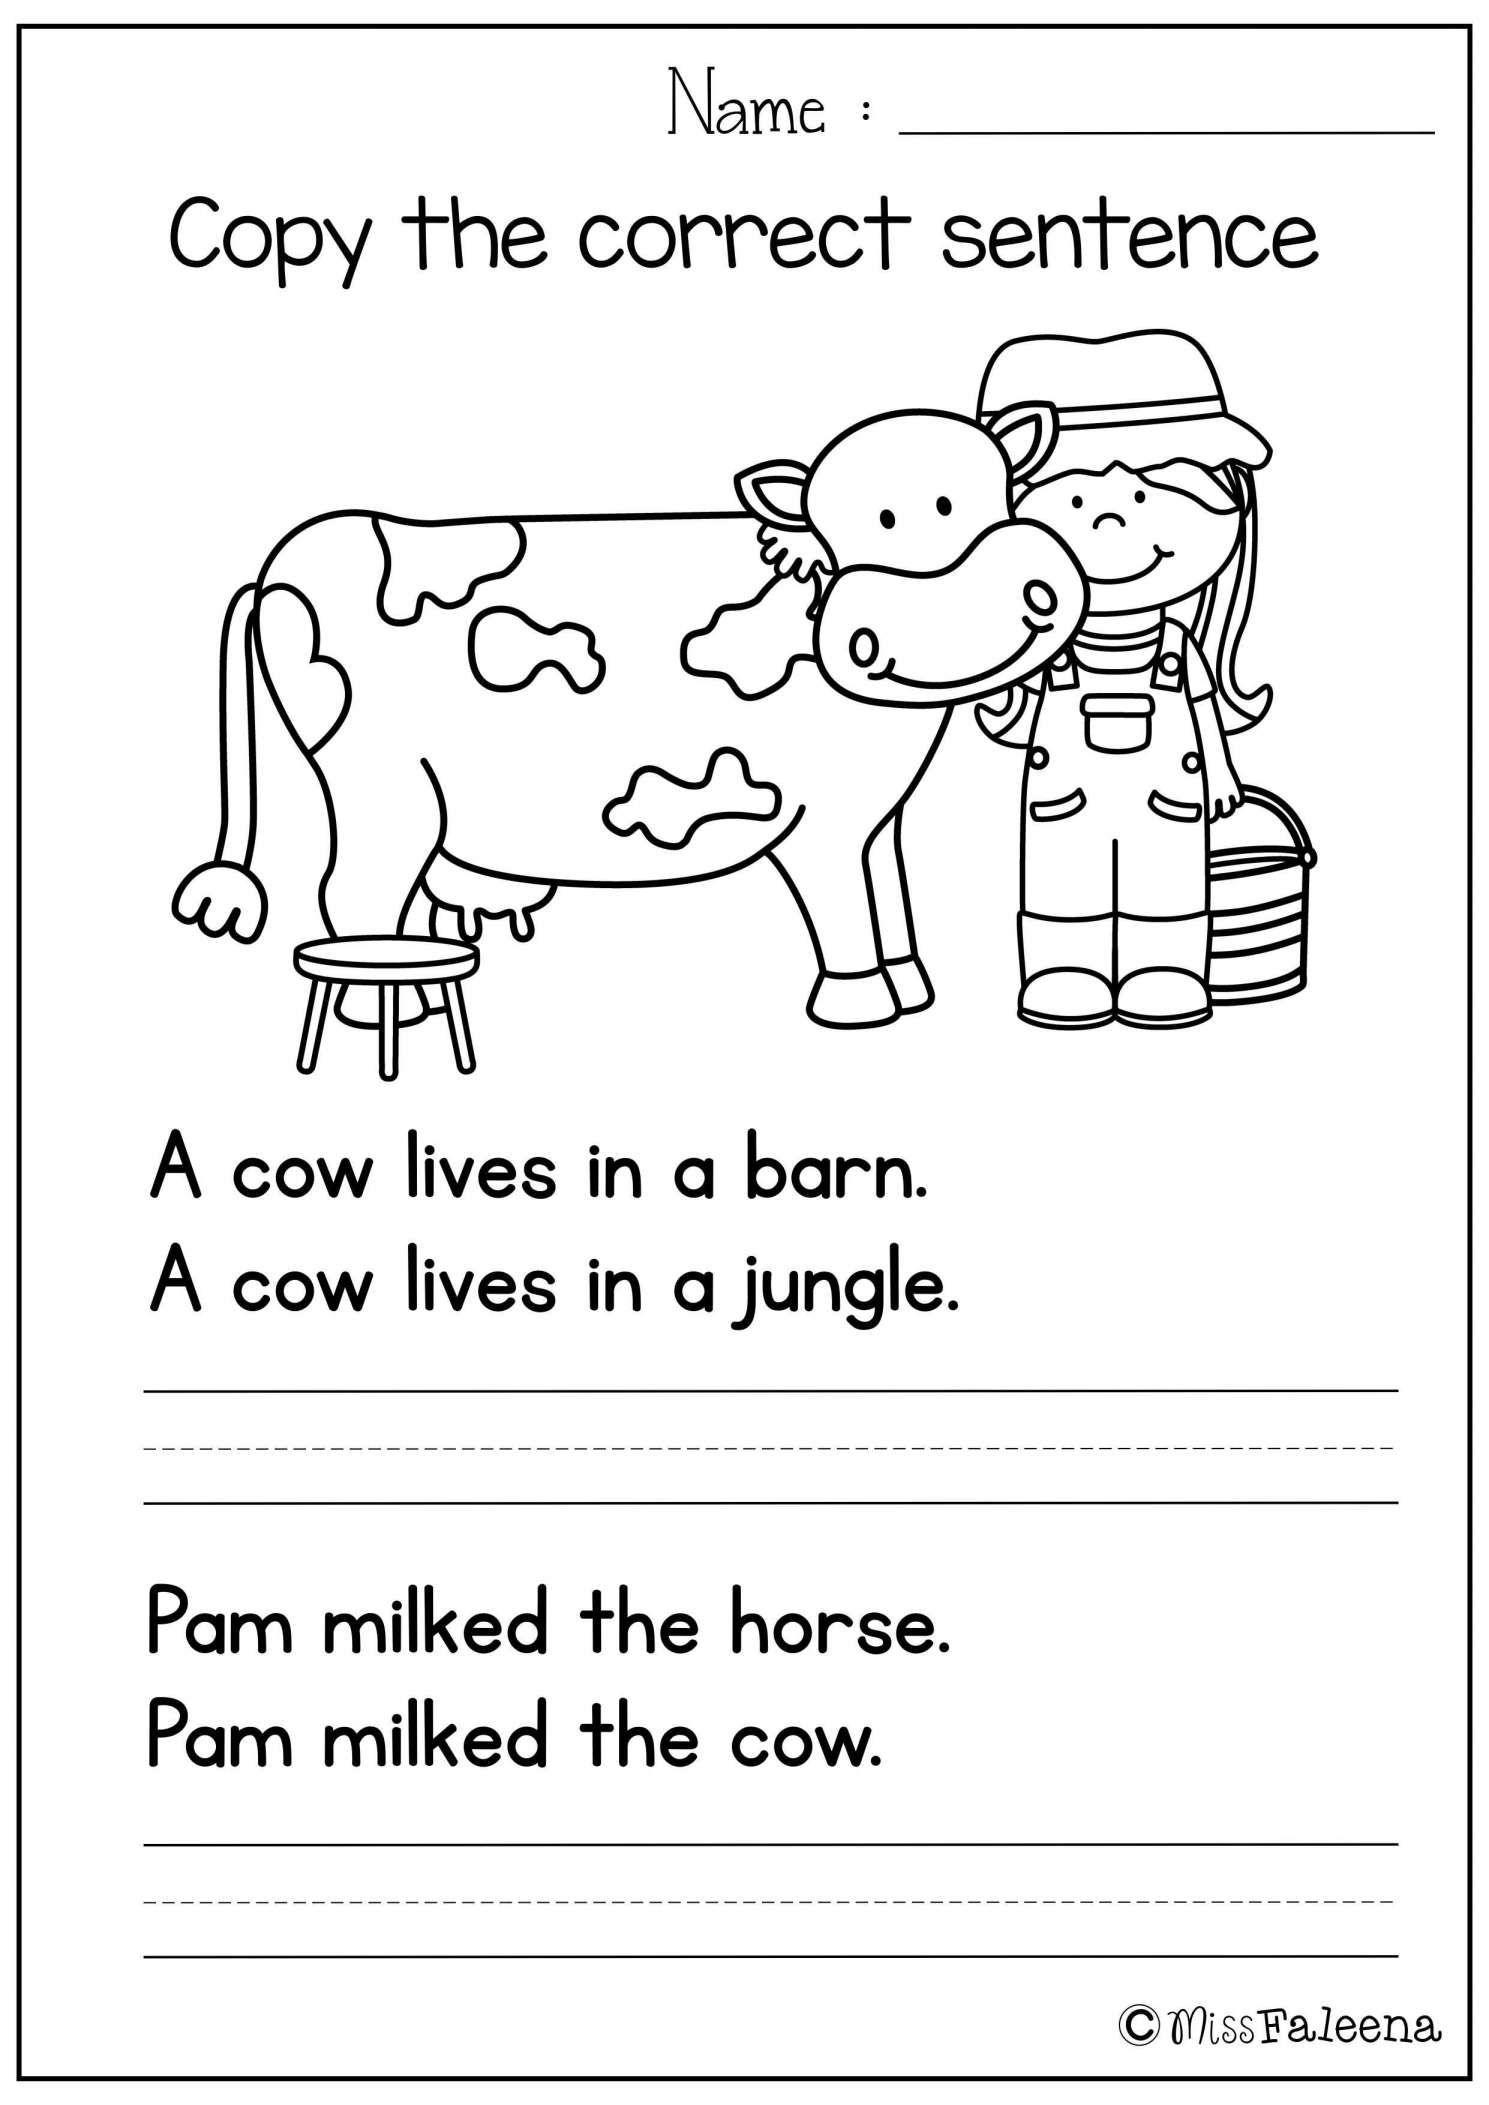 8 Correct The Sentence Worksheet Kindergarten